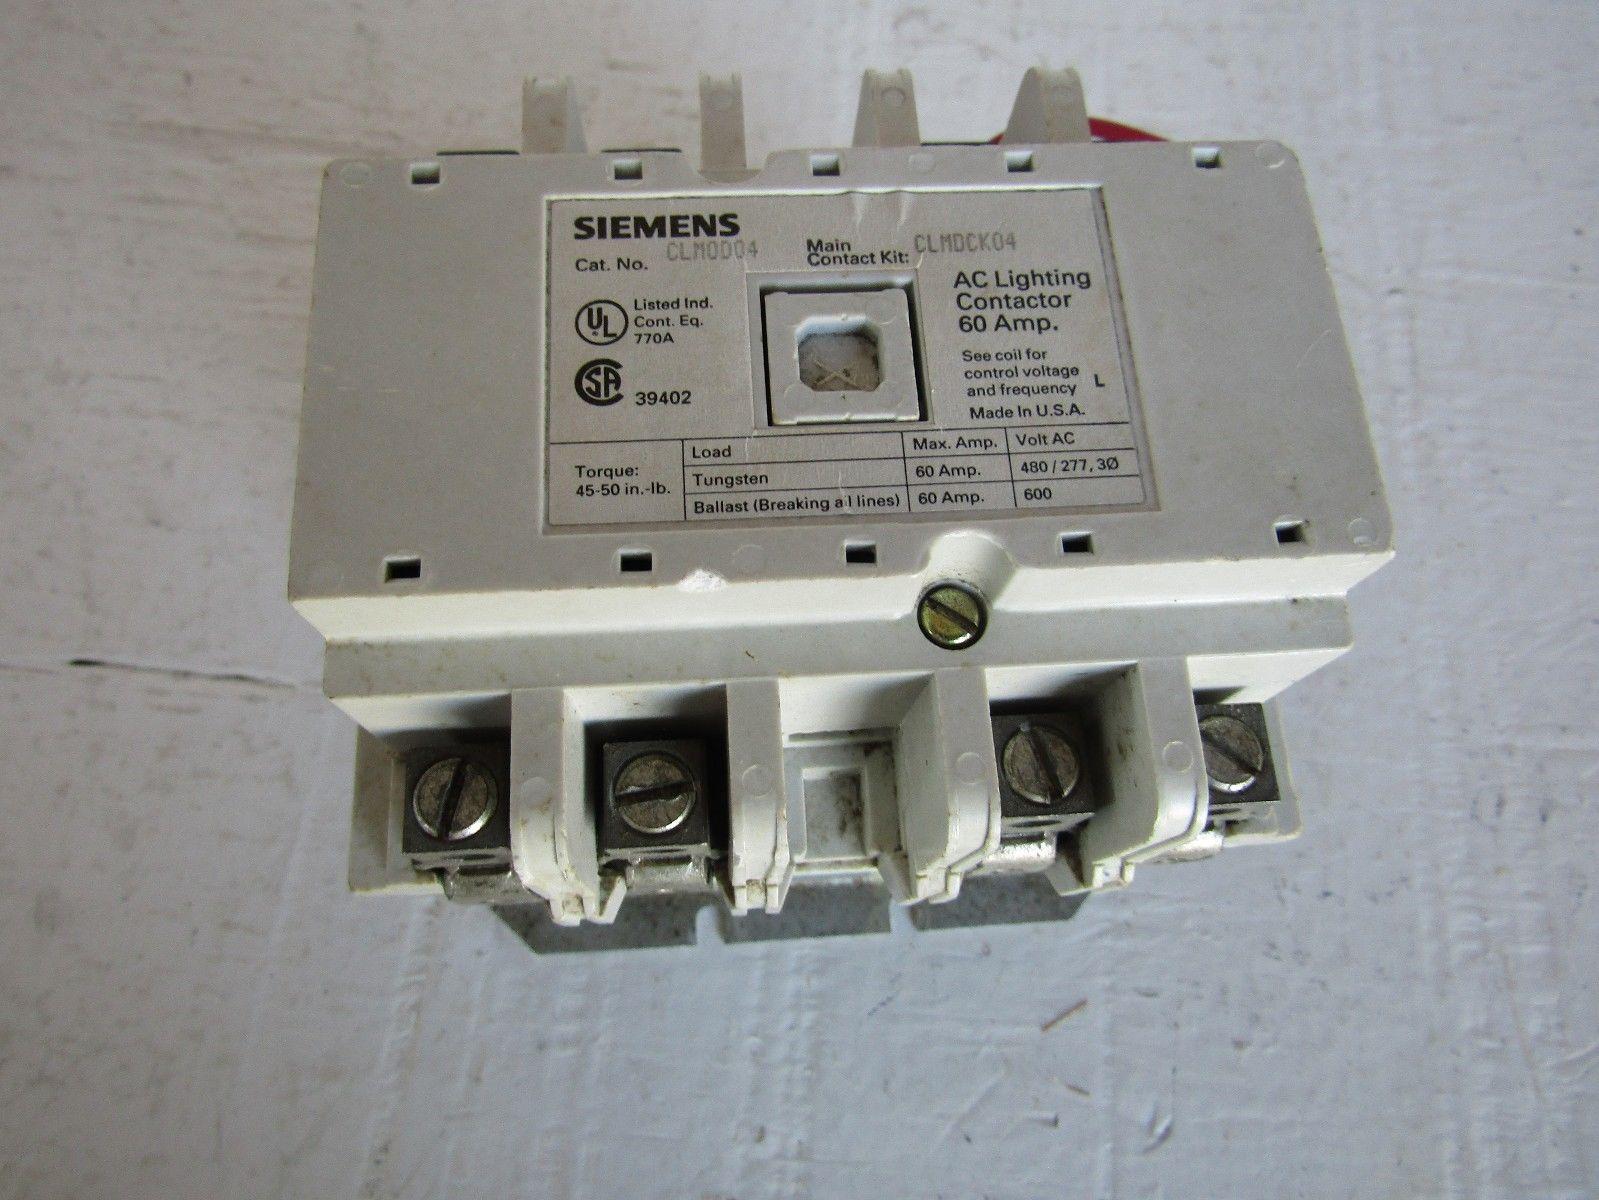 Siemens Clm Lighting Contactor Wiring Diagram Wire Data Schema Pole 8 Lilianduval Contactors Mechanically Held Single